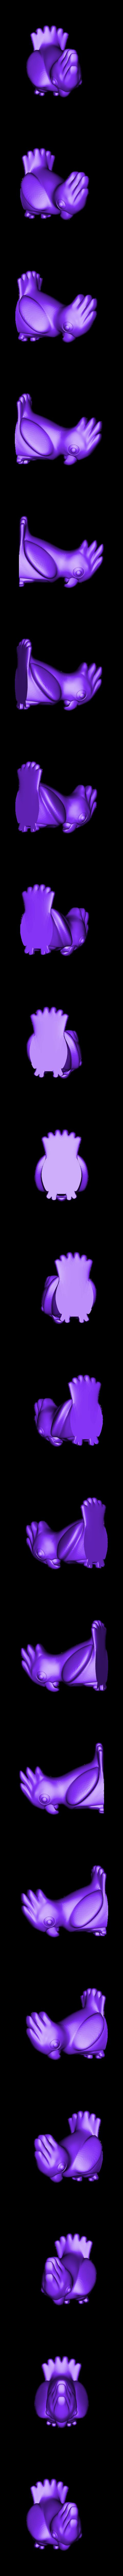 cockatoo_fill.stl Download free STL file cockatoo • 3D printer template, bs3